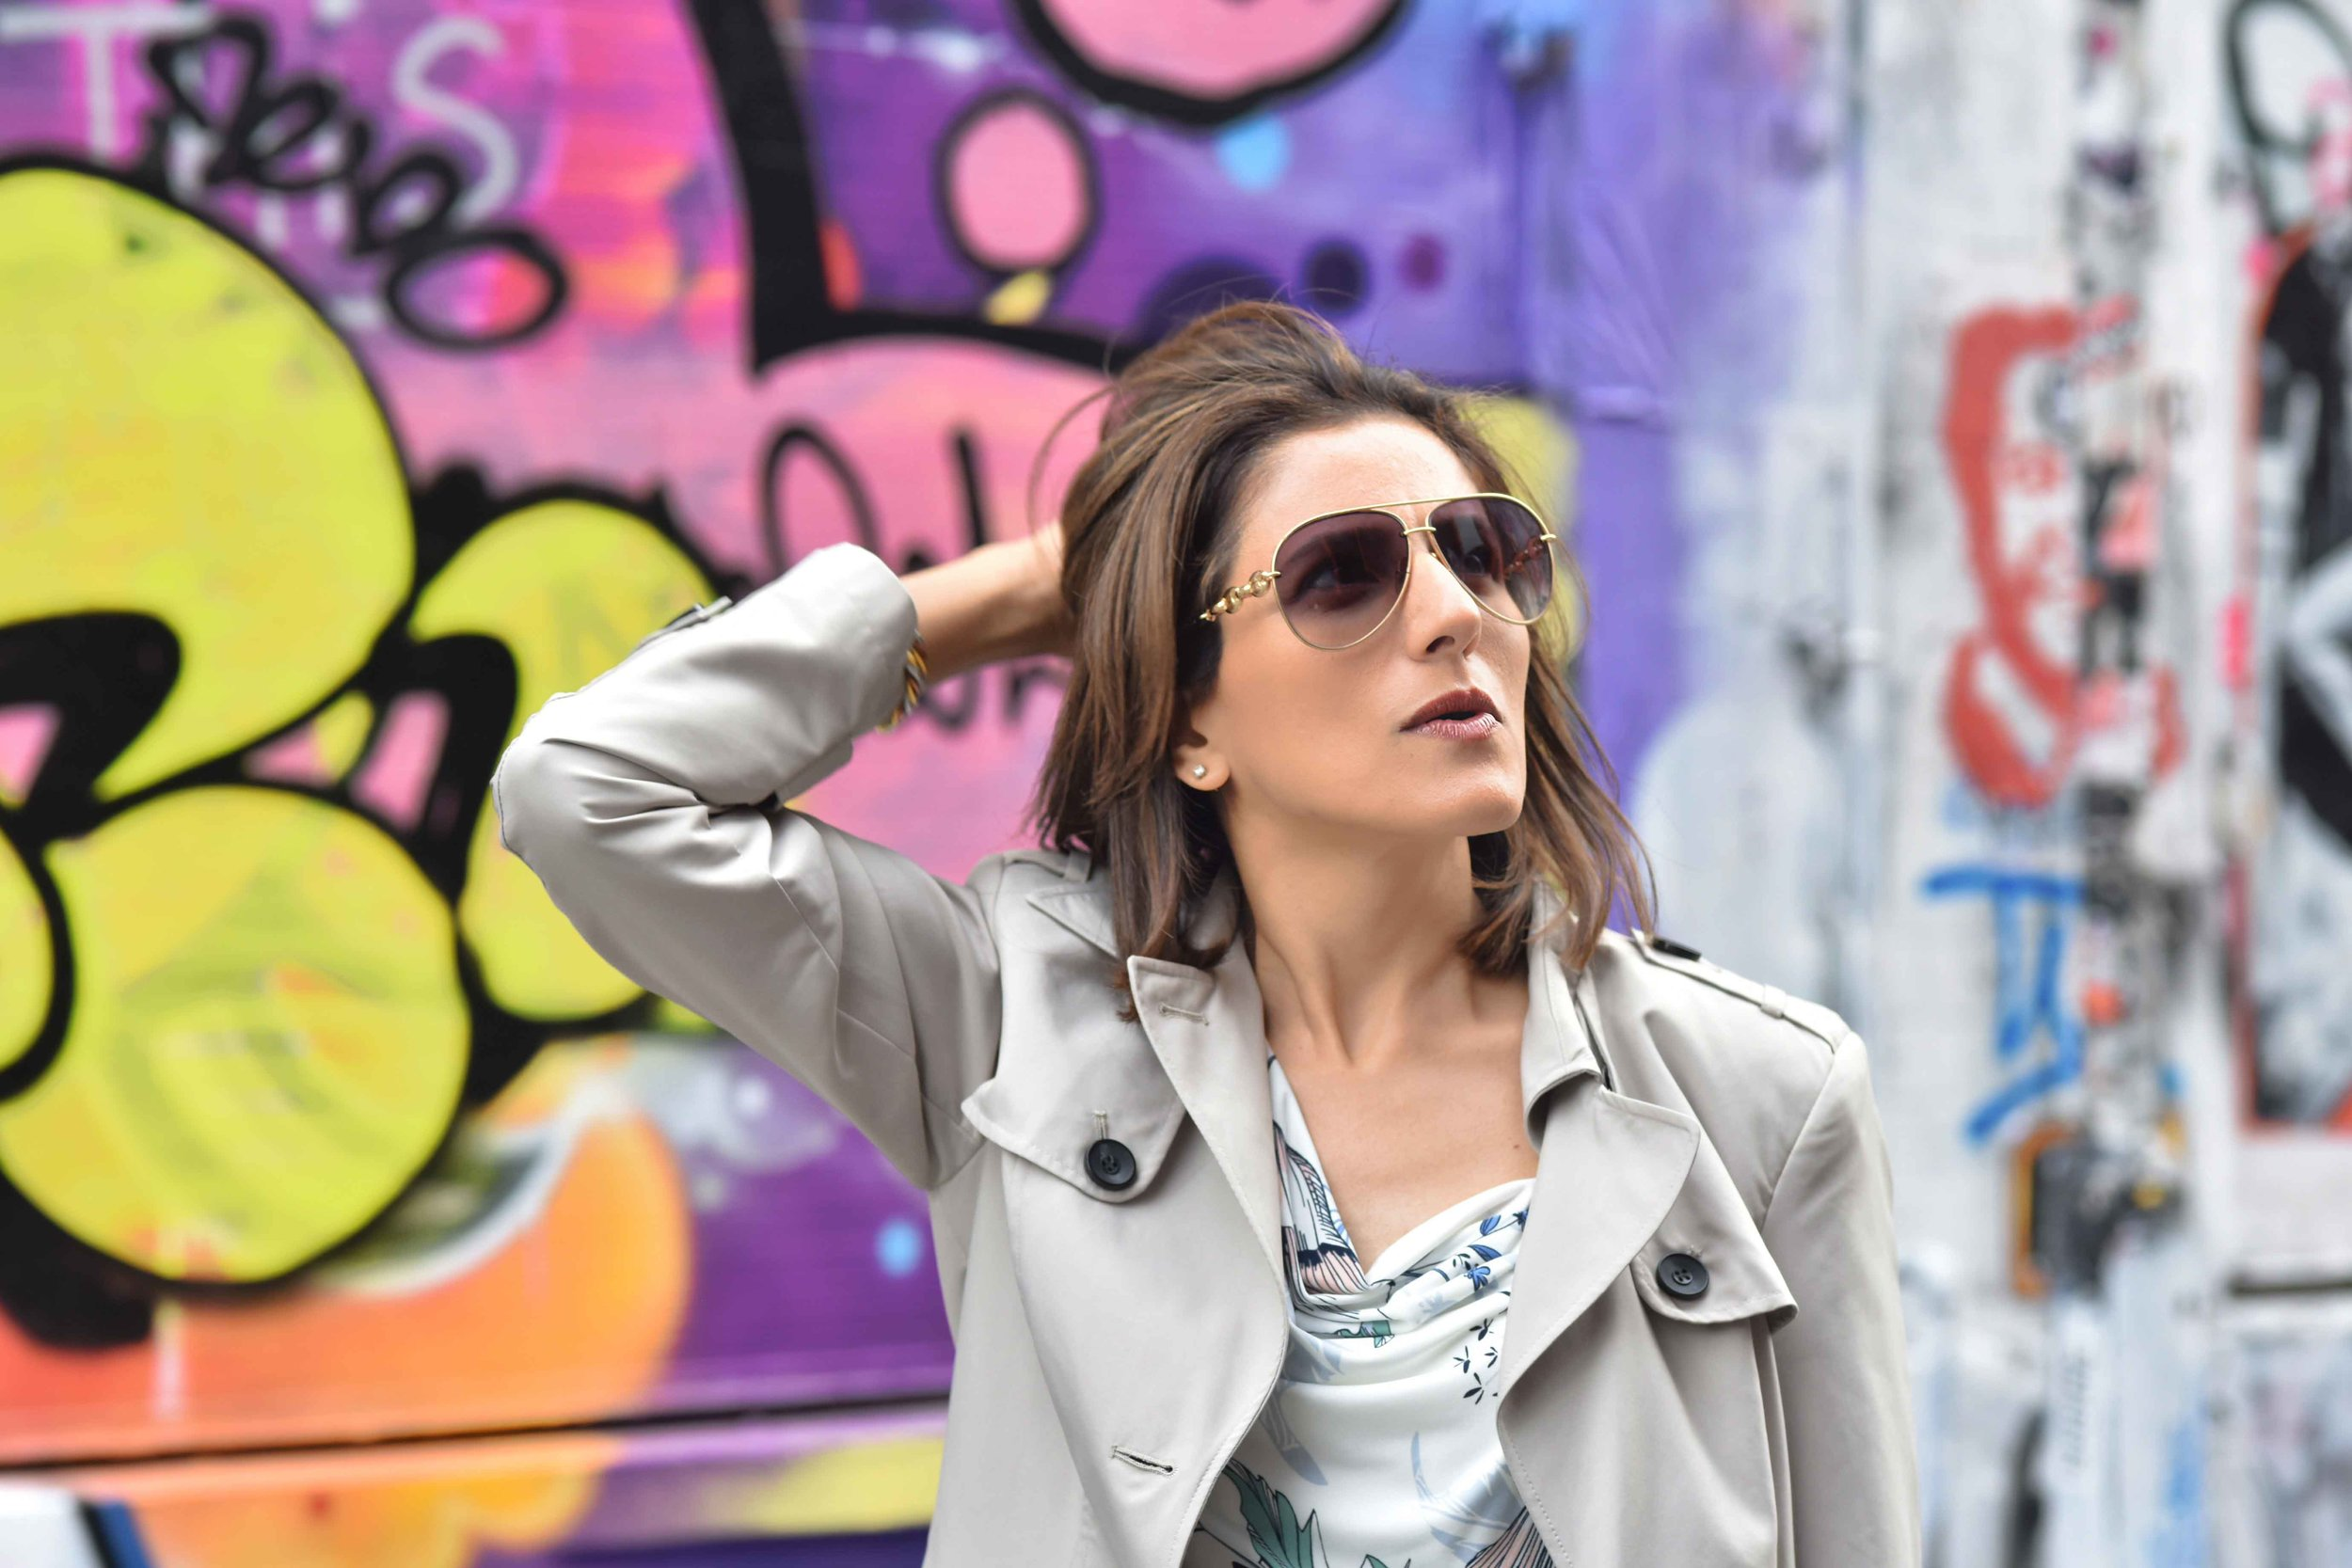 Marks and Spencer shift dress, Marks and Spencer trench, Gucci sunglasses, graffiti street art, street fashion, Shoreditch, London, U.K. Photo: Nina Shaw, Image©sourcingstyle.com